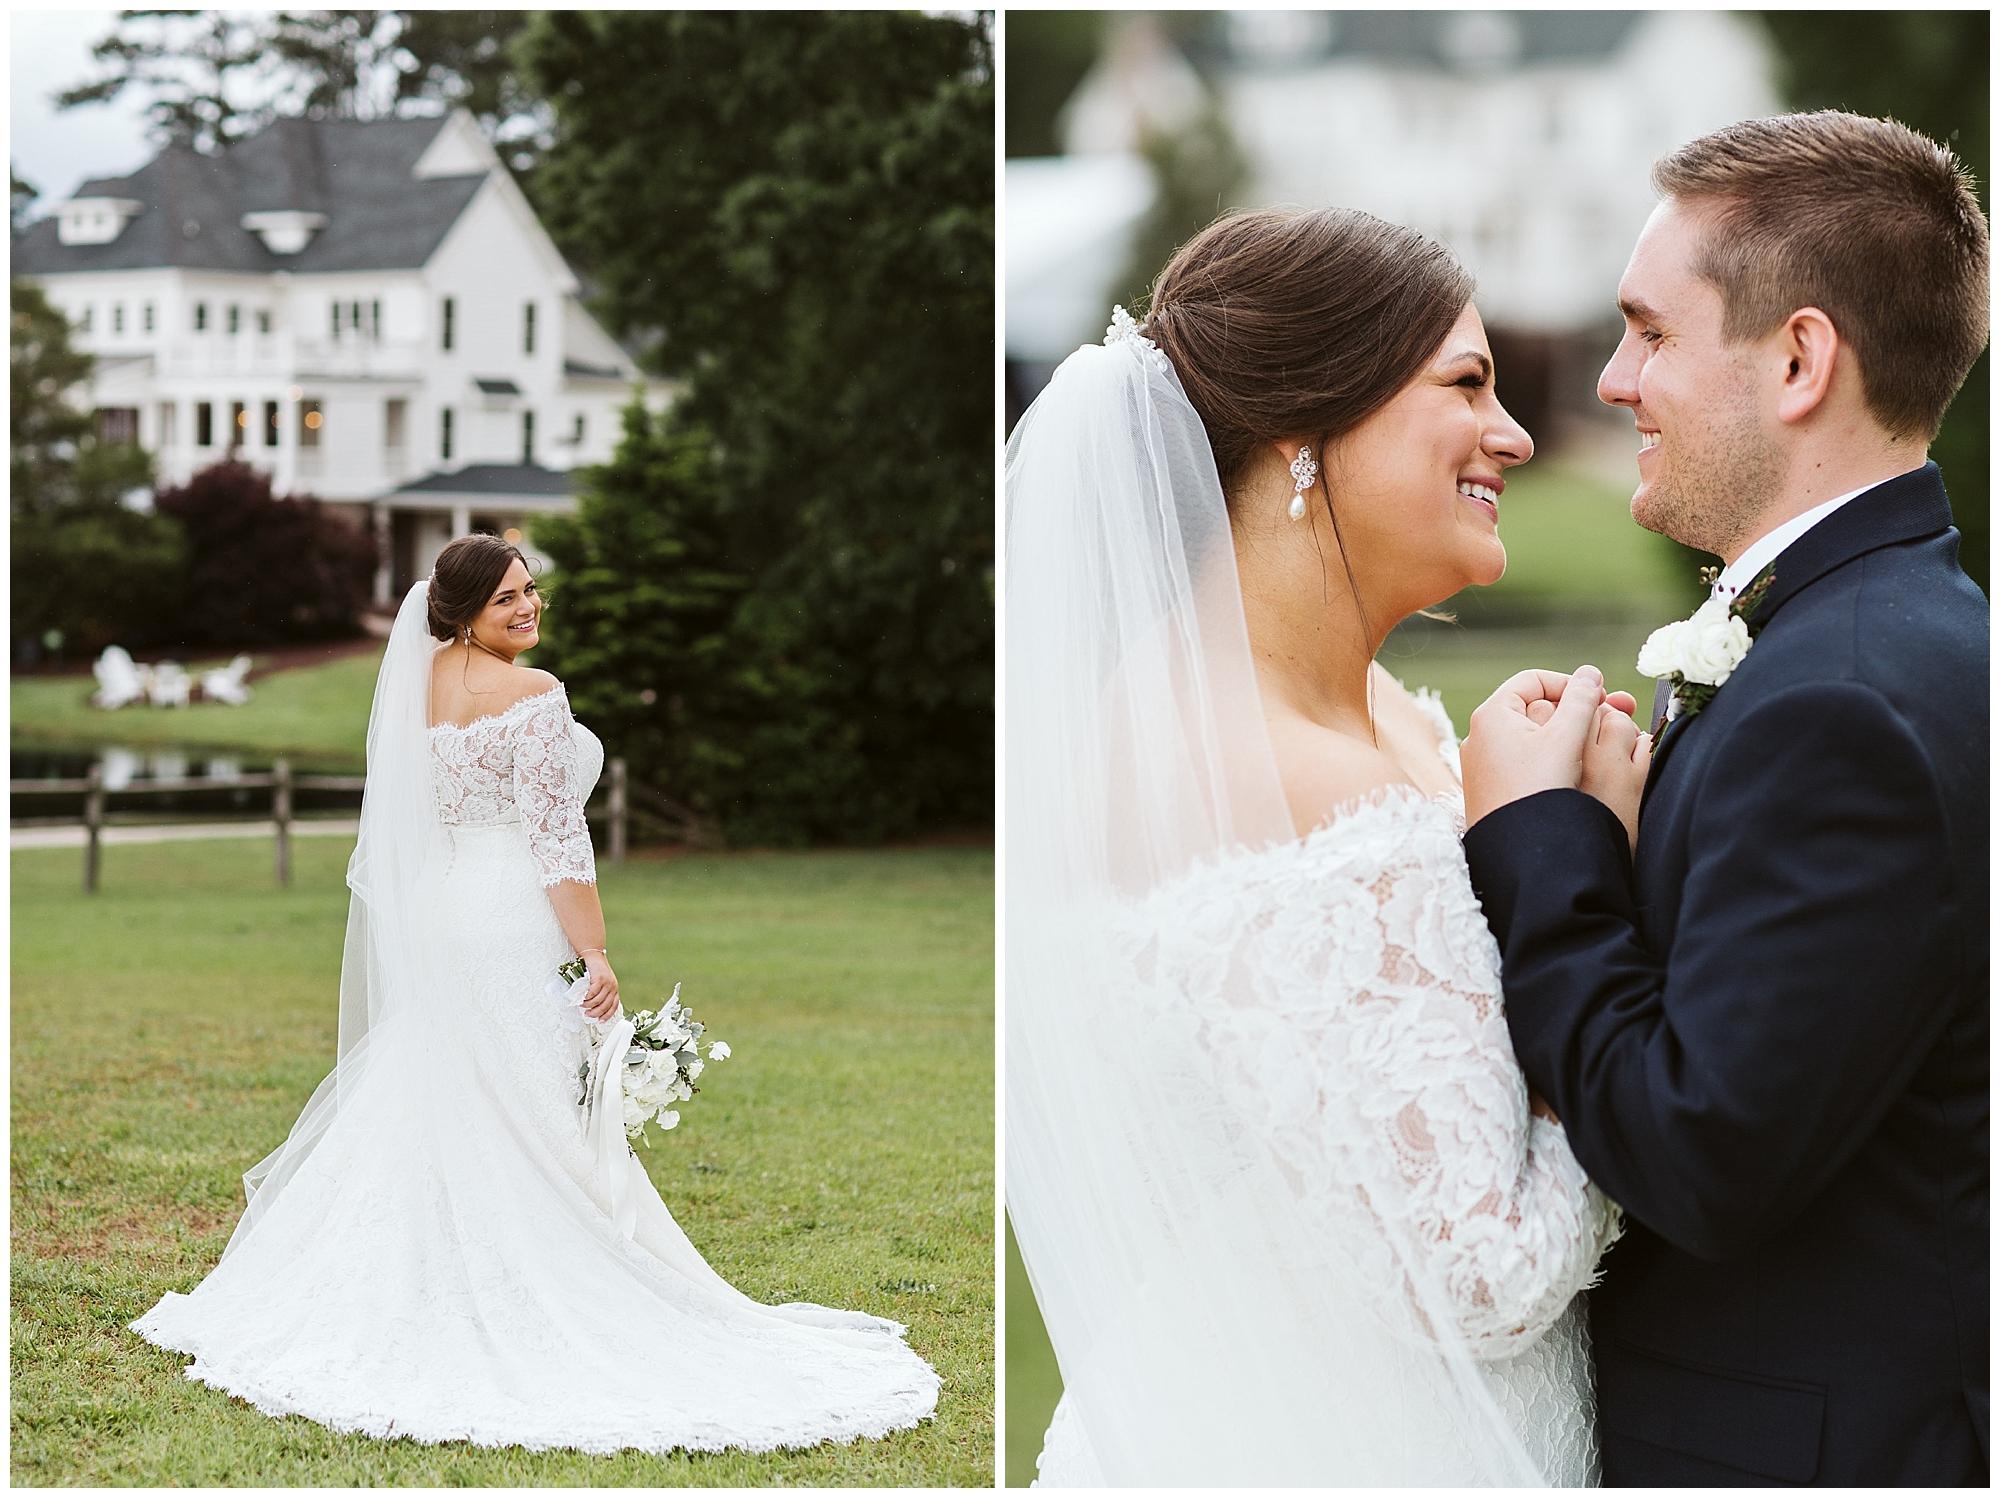 Oaks-at-salem-wedding-apex-photography-83.jpg